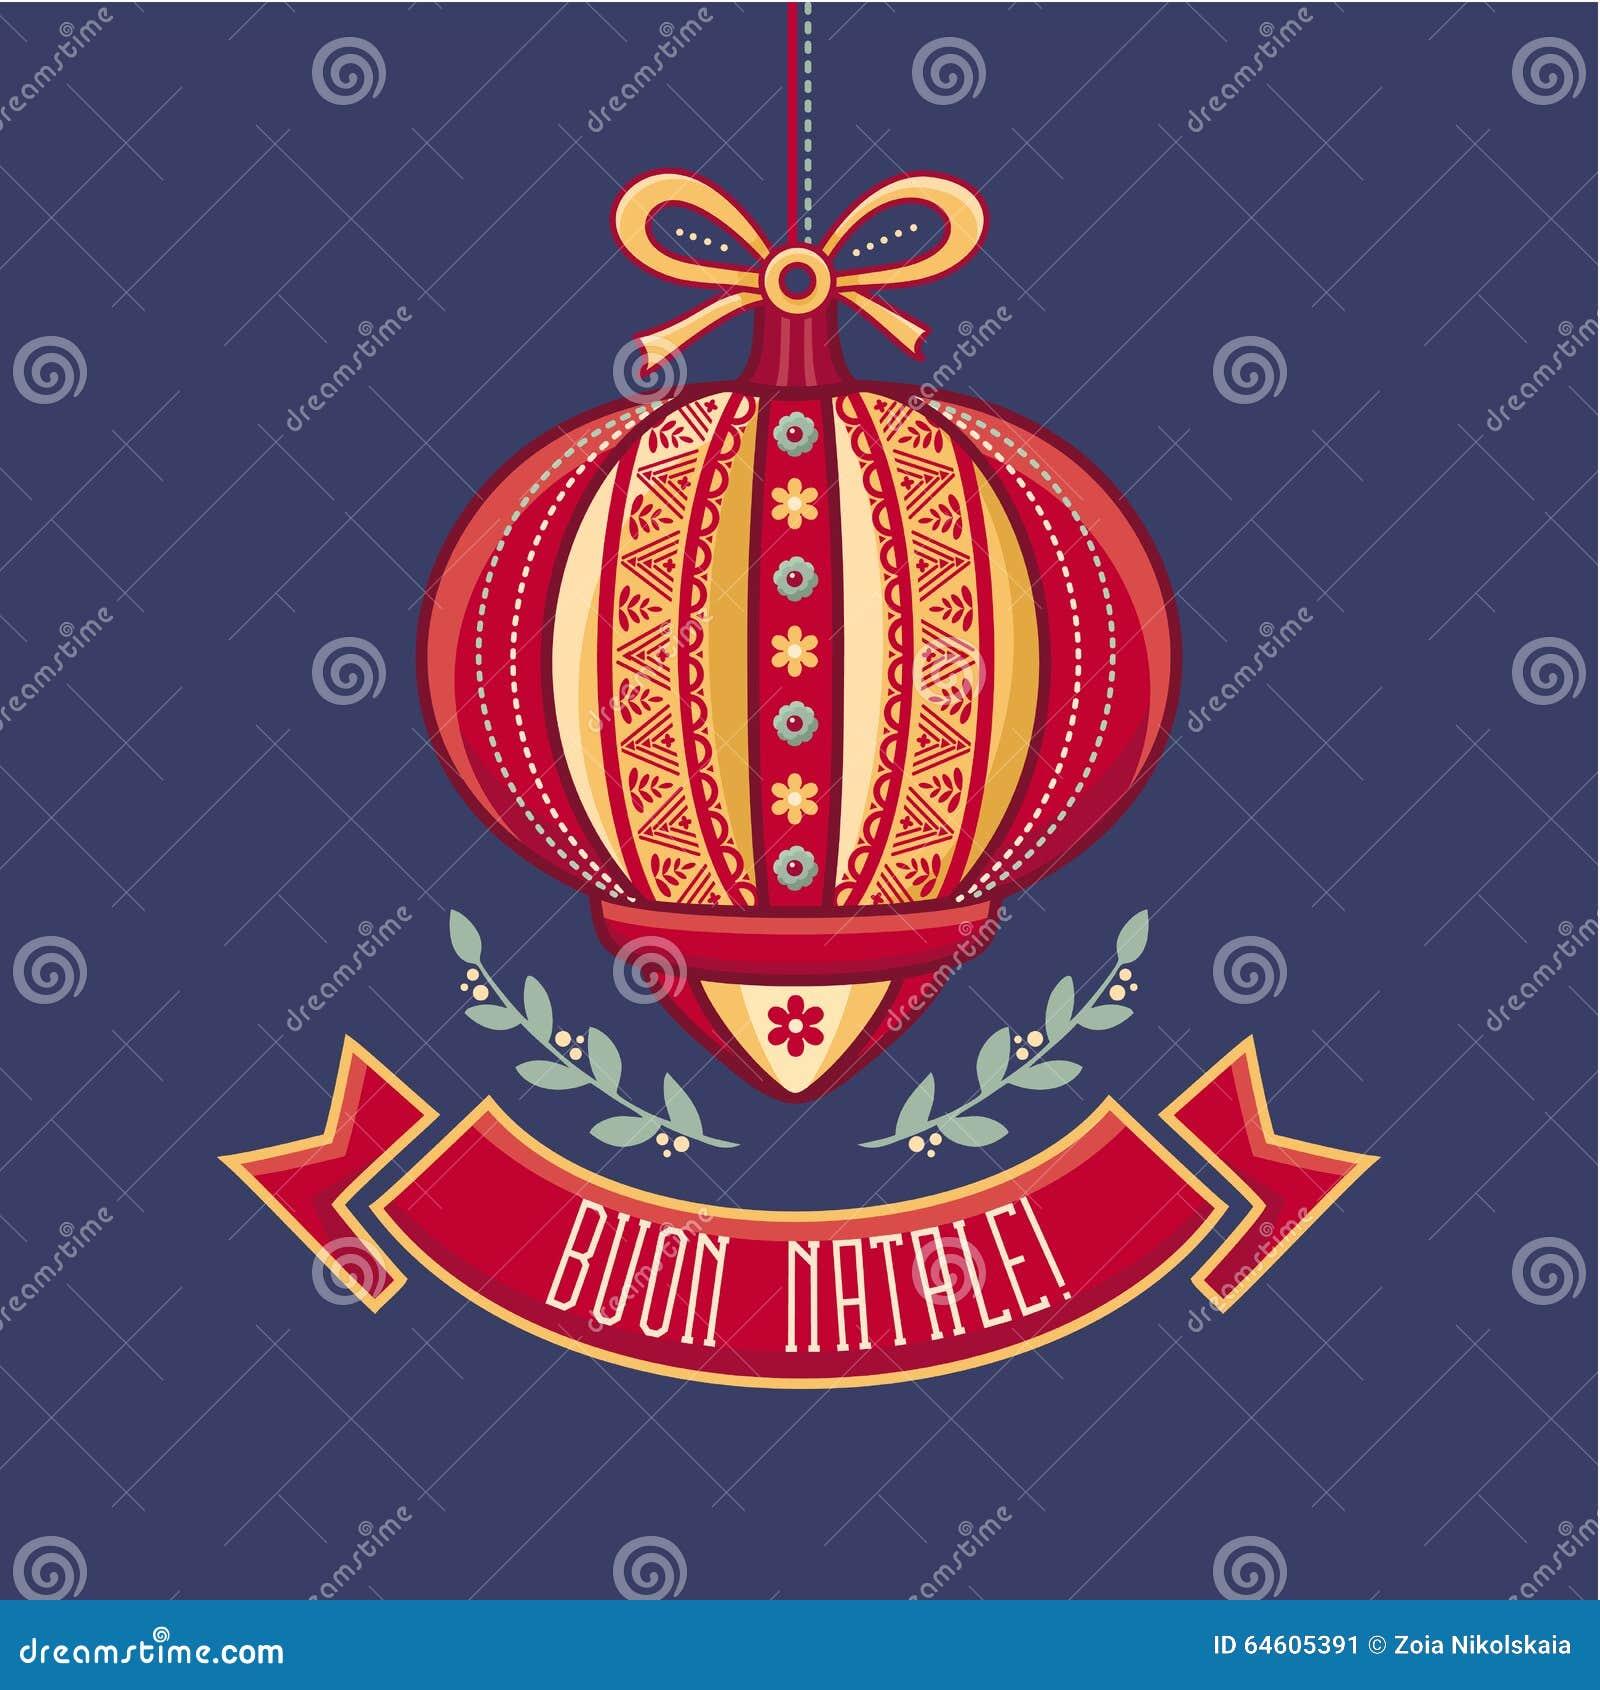 Merry christmas italy stock vector illustration of green 22141304 italy christmas card merry christmas greetings card stock illustration m4hsunfo